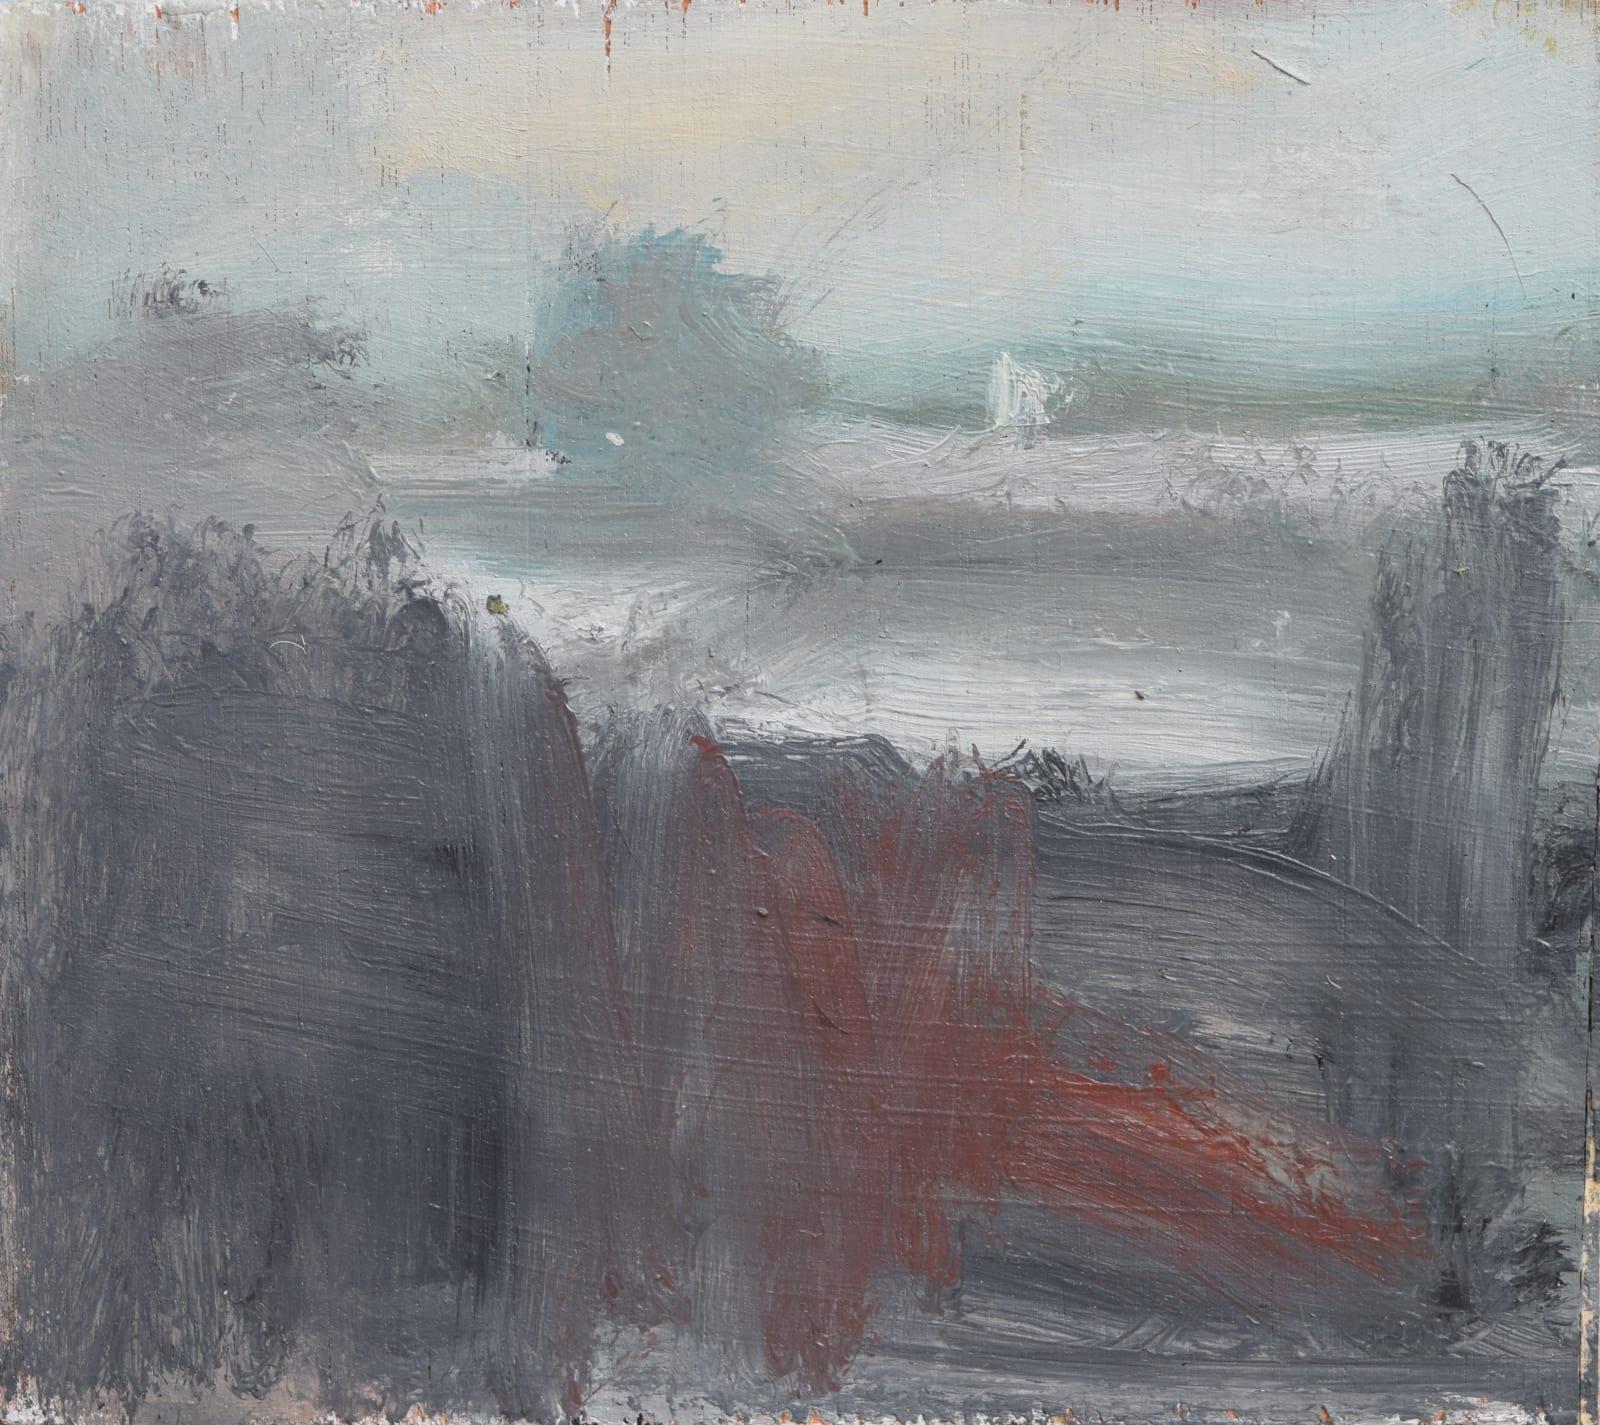 Ian Mood, River Irwell Dusk, 2018